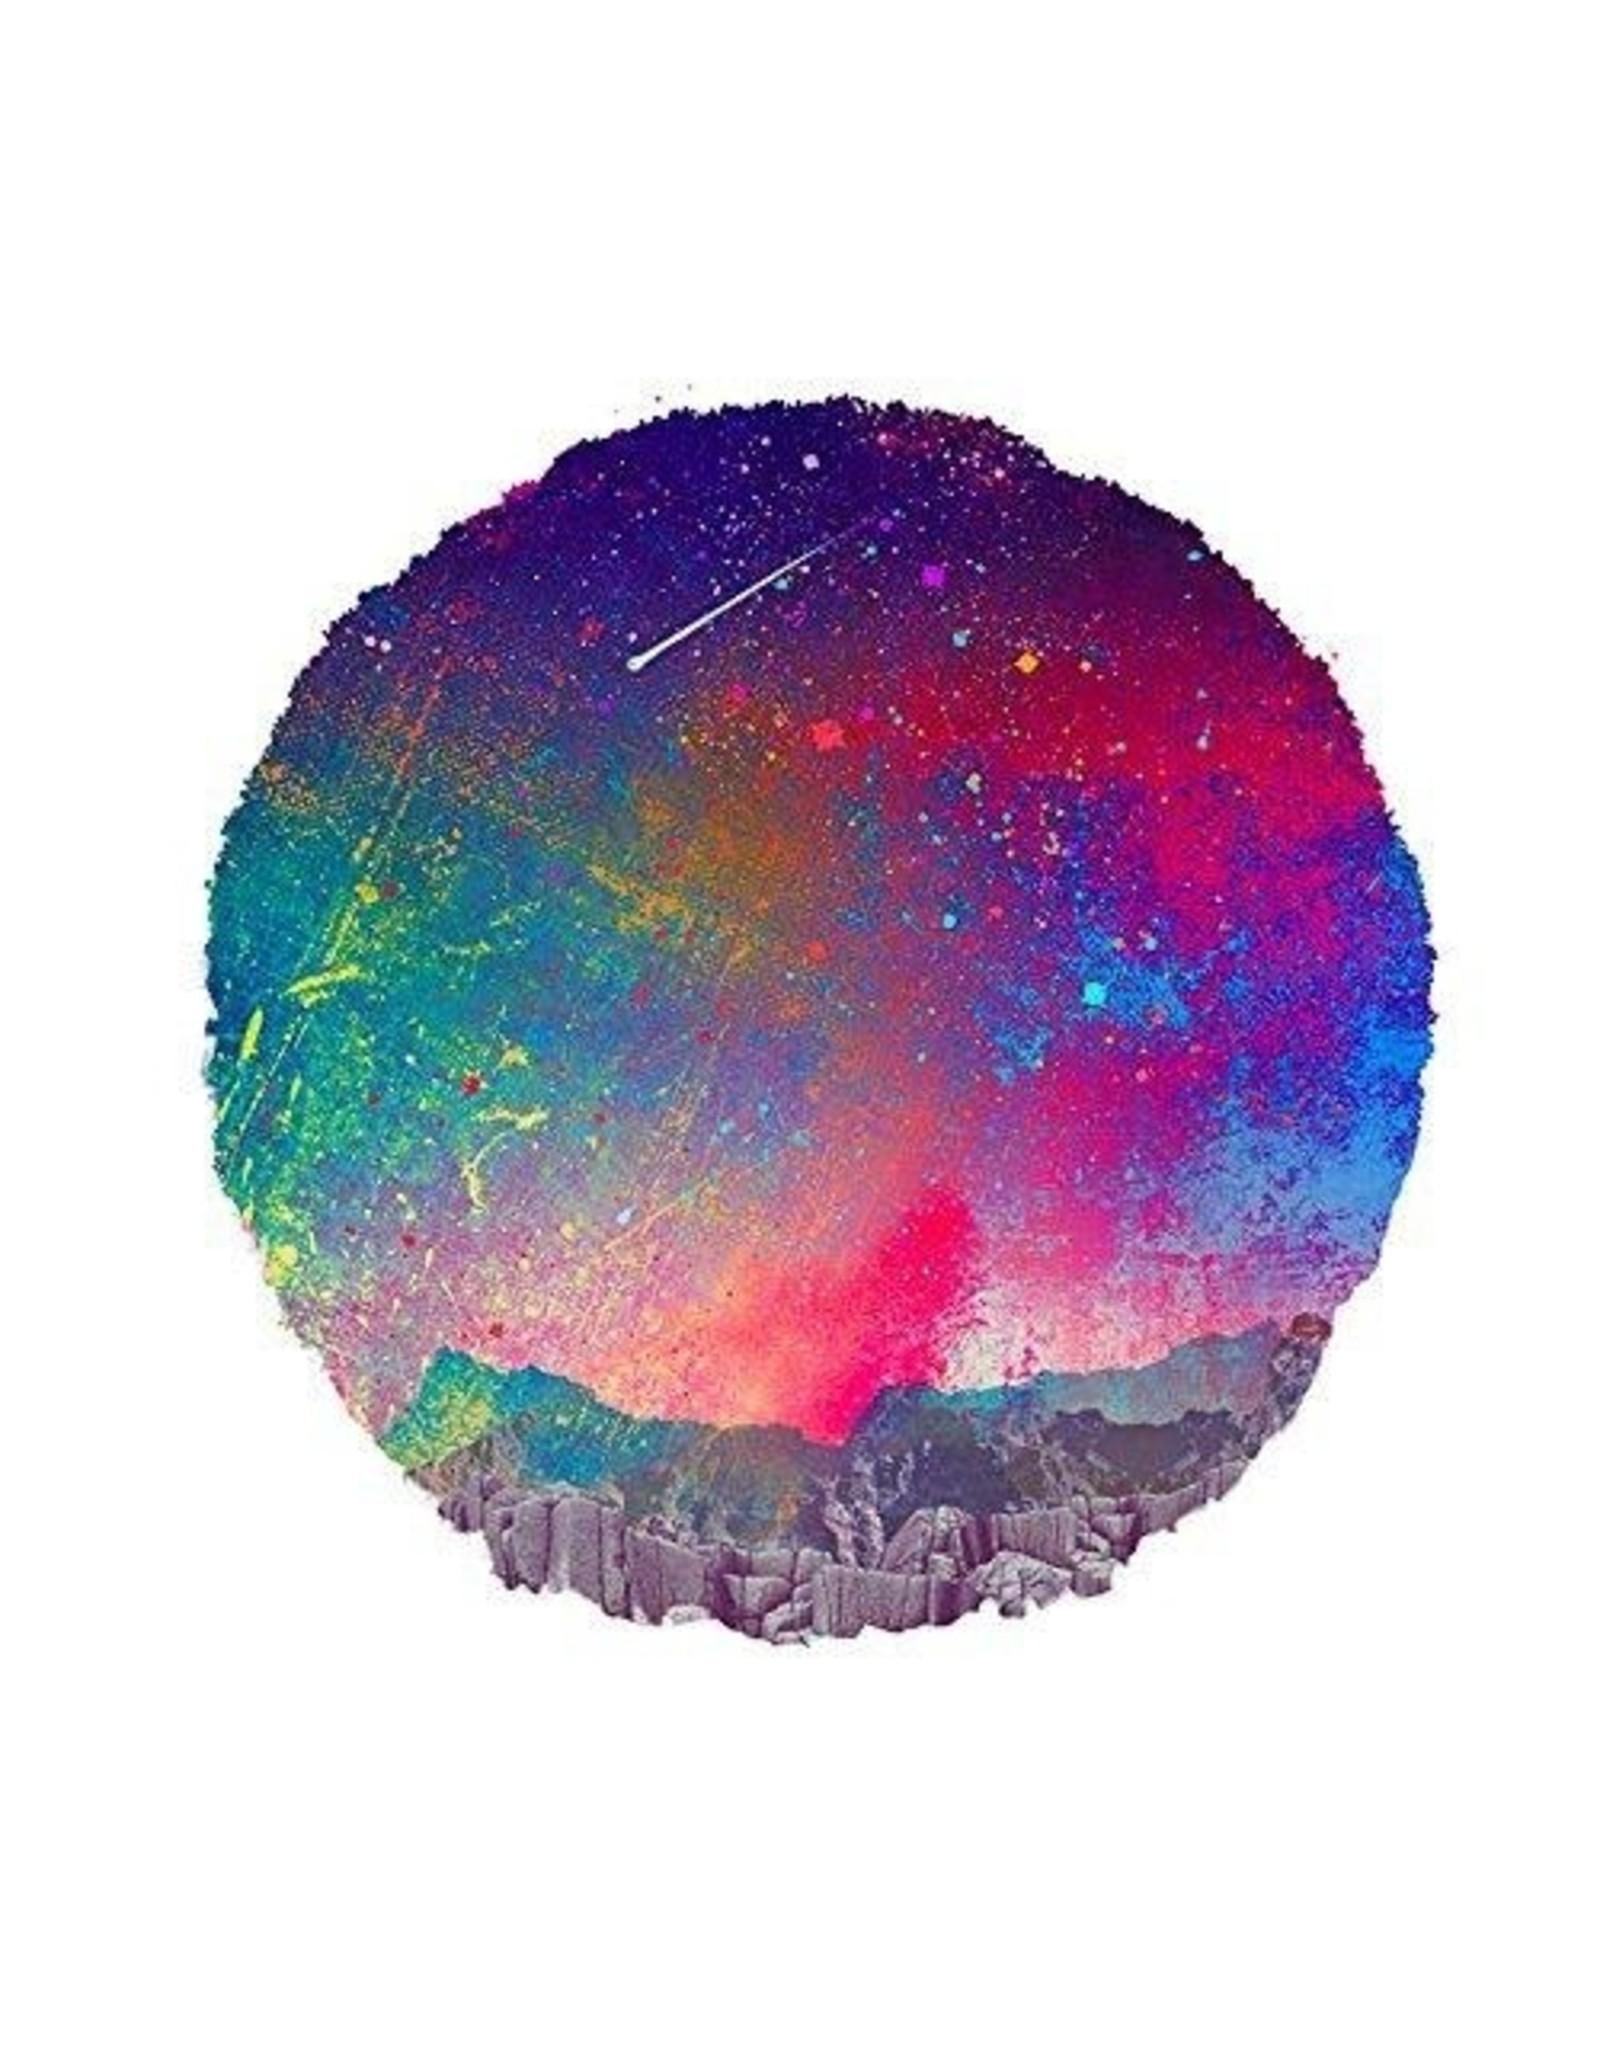 New Vinyl Khruangbin - The Universe Smiles Upon You LP